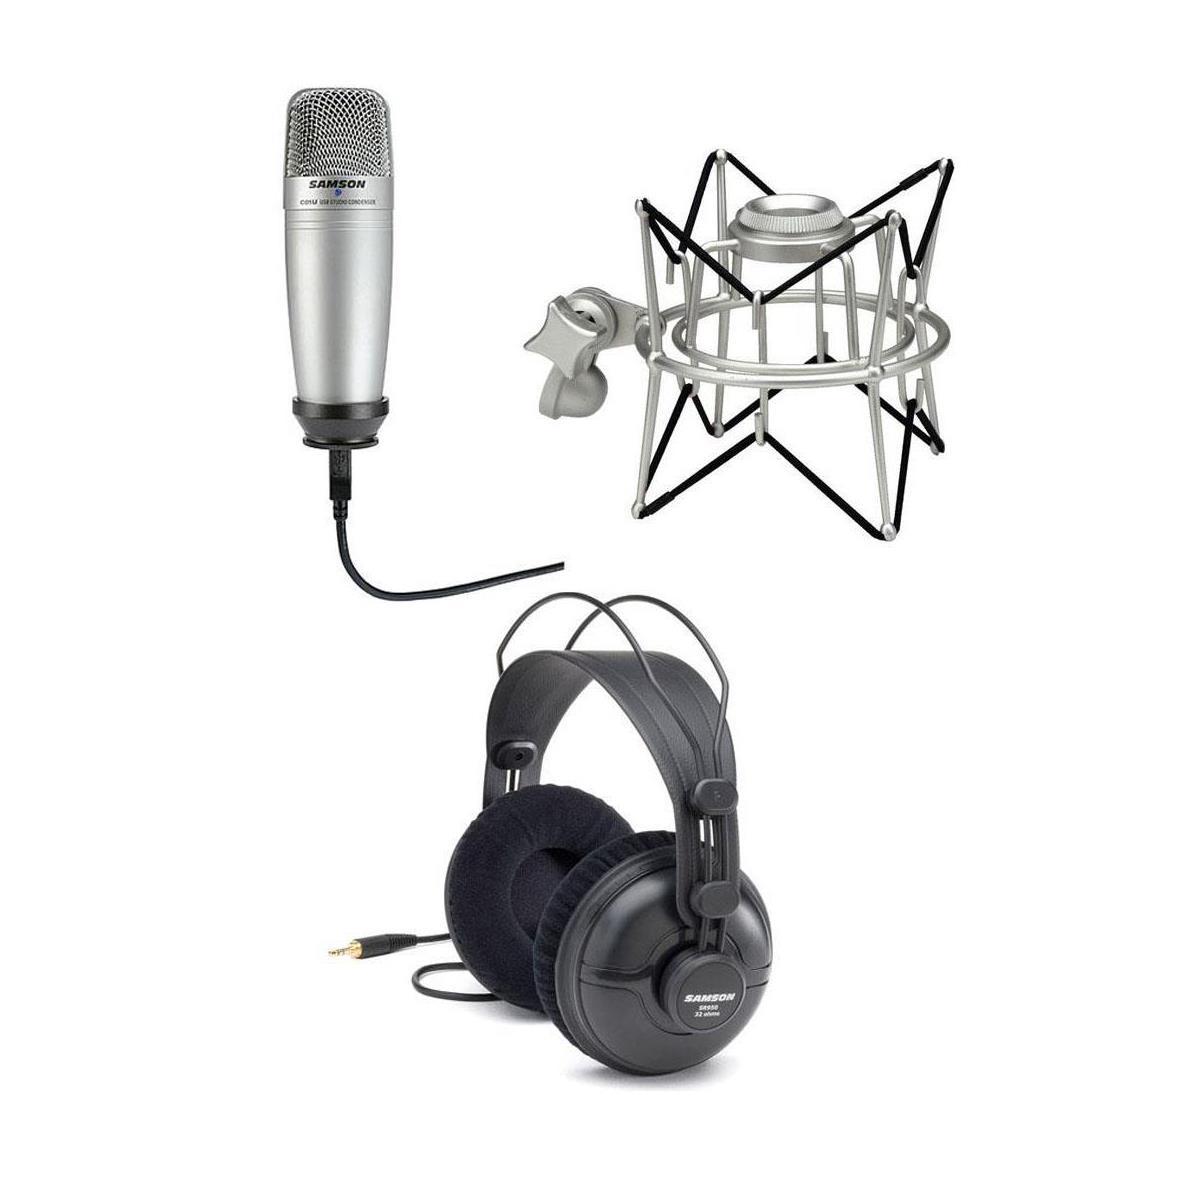 Samson SR950 Headphones + USB Condenser Microphone + Shock Mount